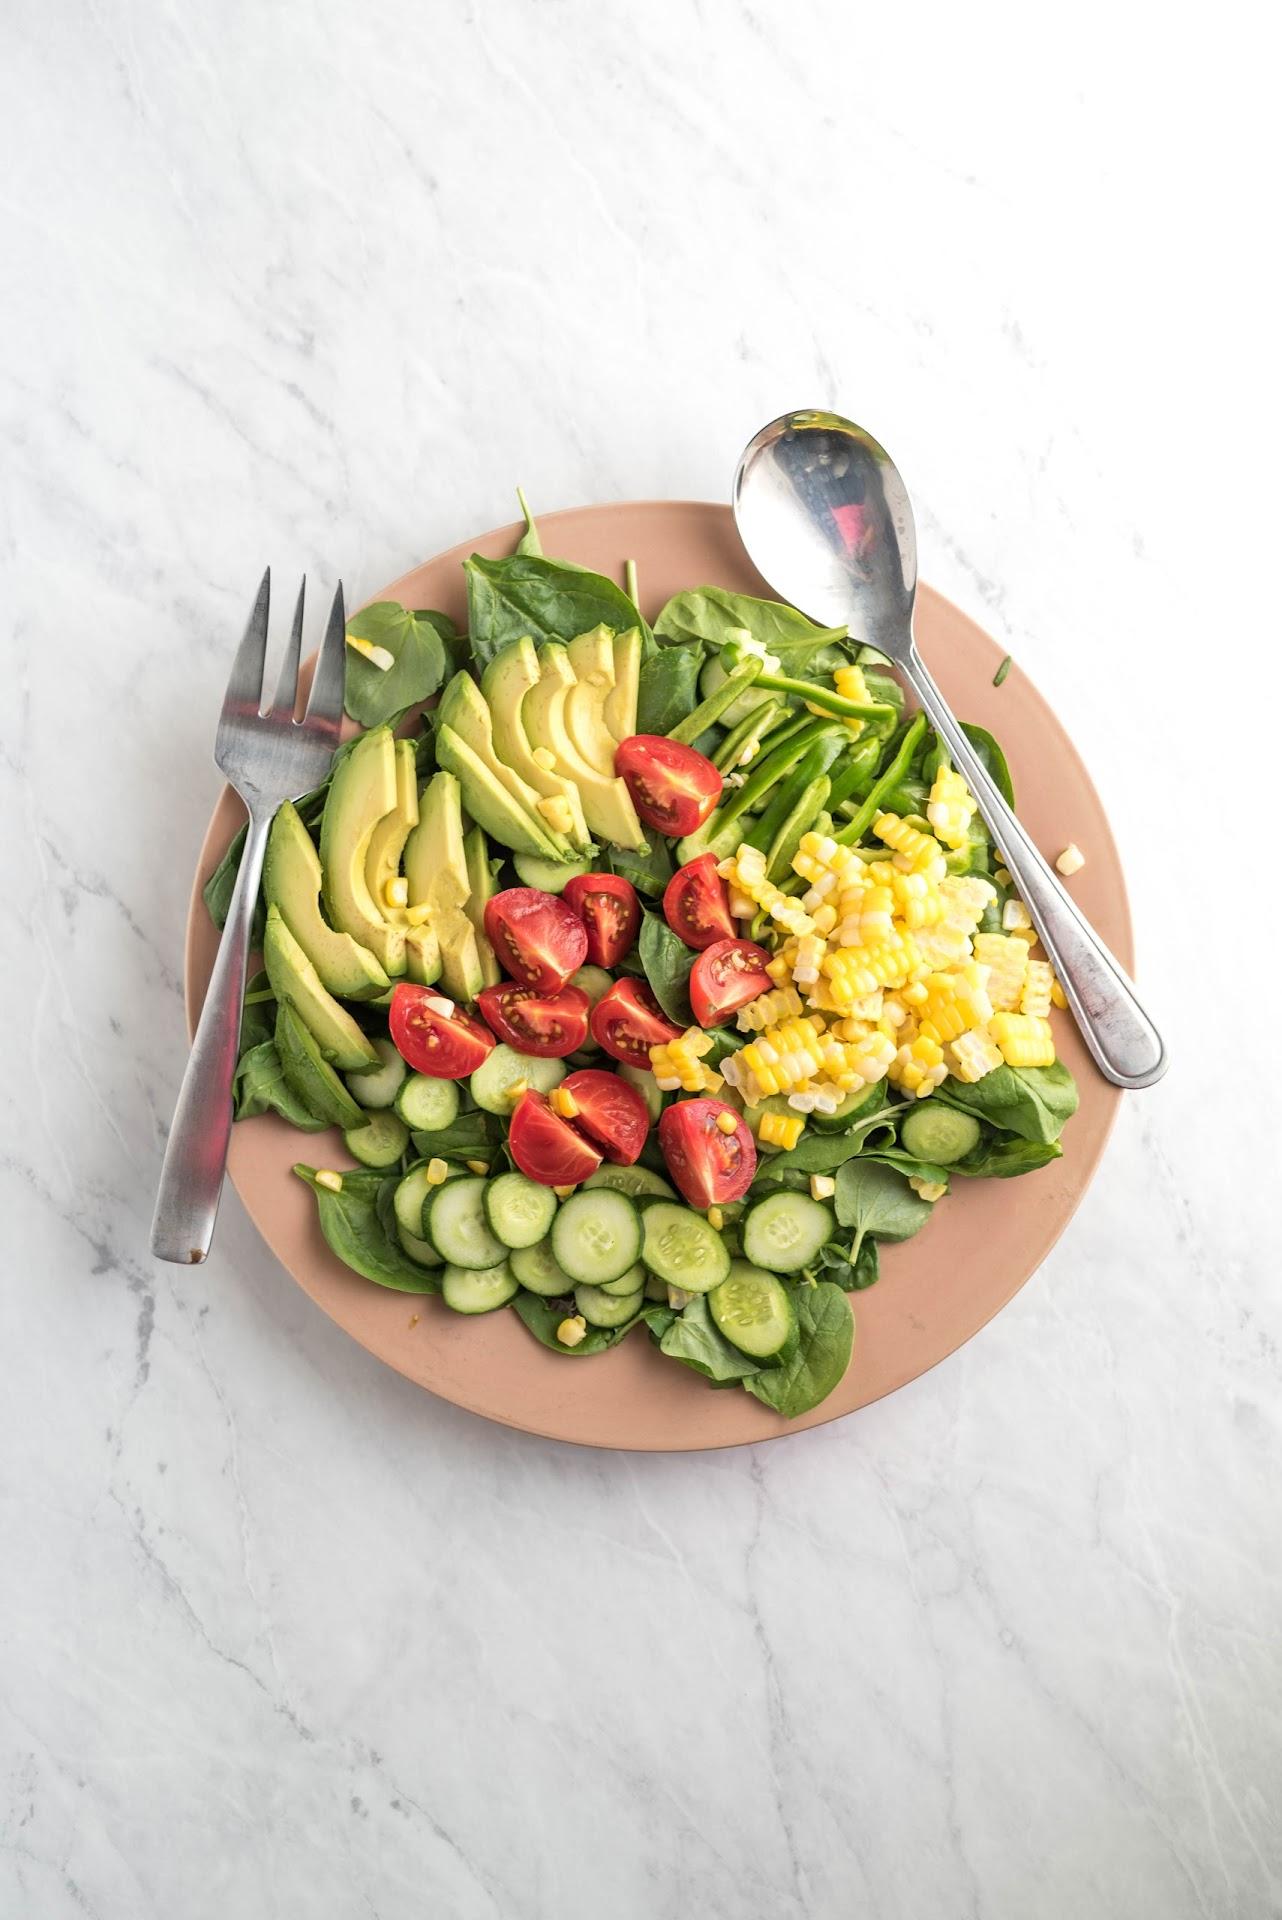 fresh salad, pretty salad, gourmet, avocado, healthy, corn, best salad, dinner, food inspo, side dish idea, food photography, colorful